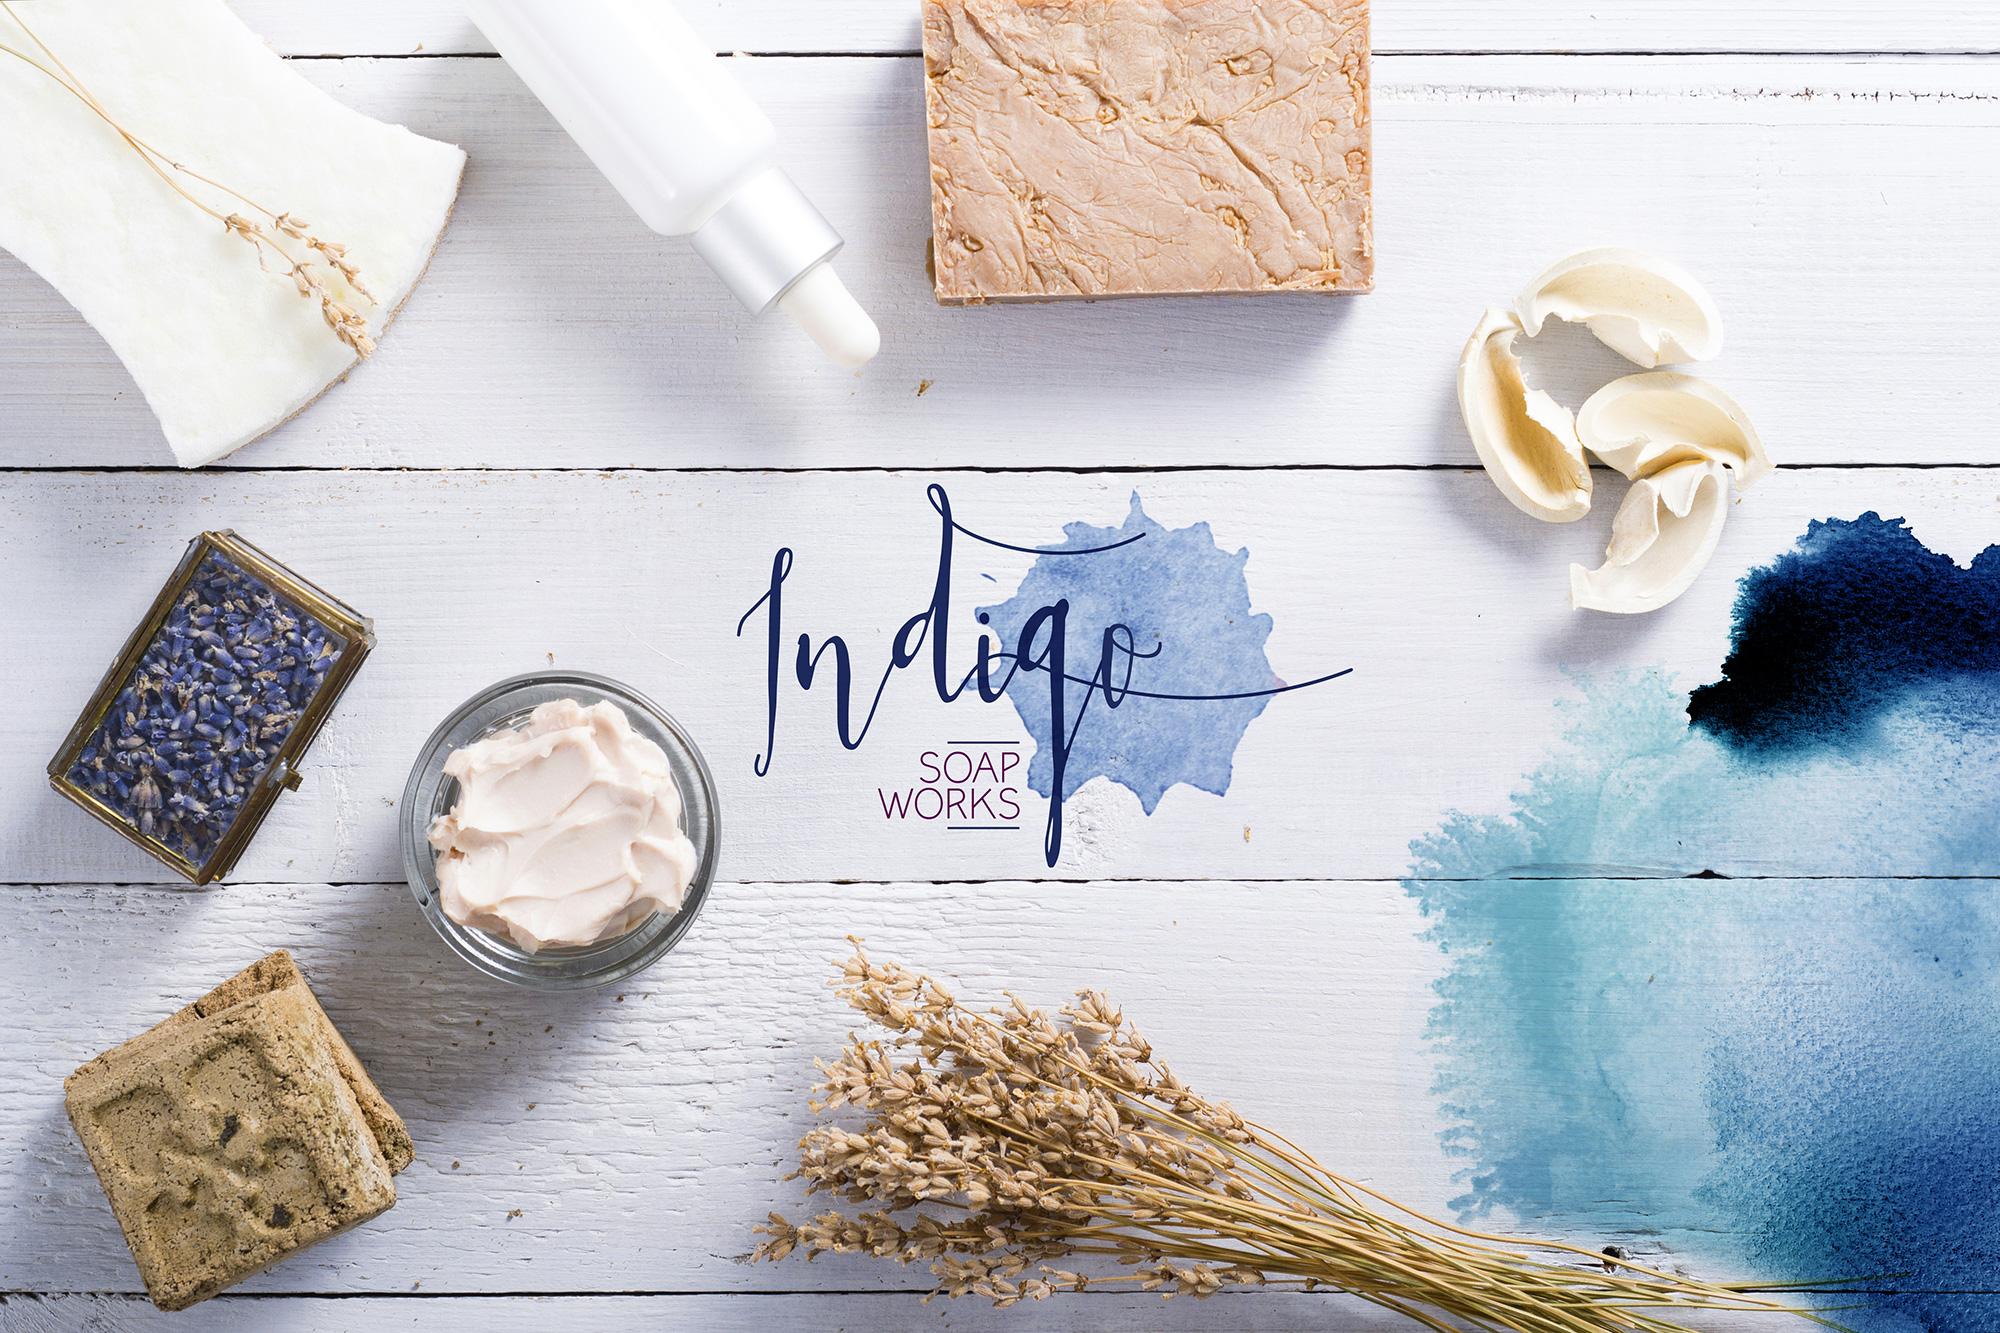 Indigo Soap Works - Branding